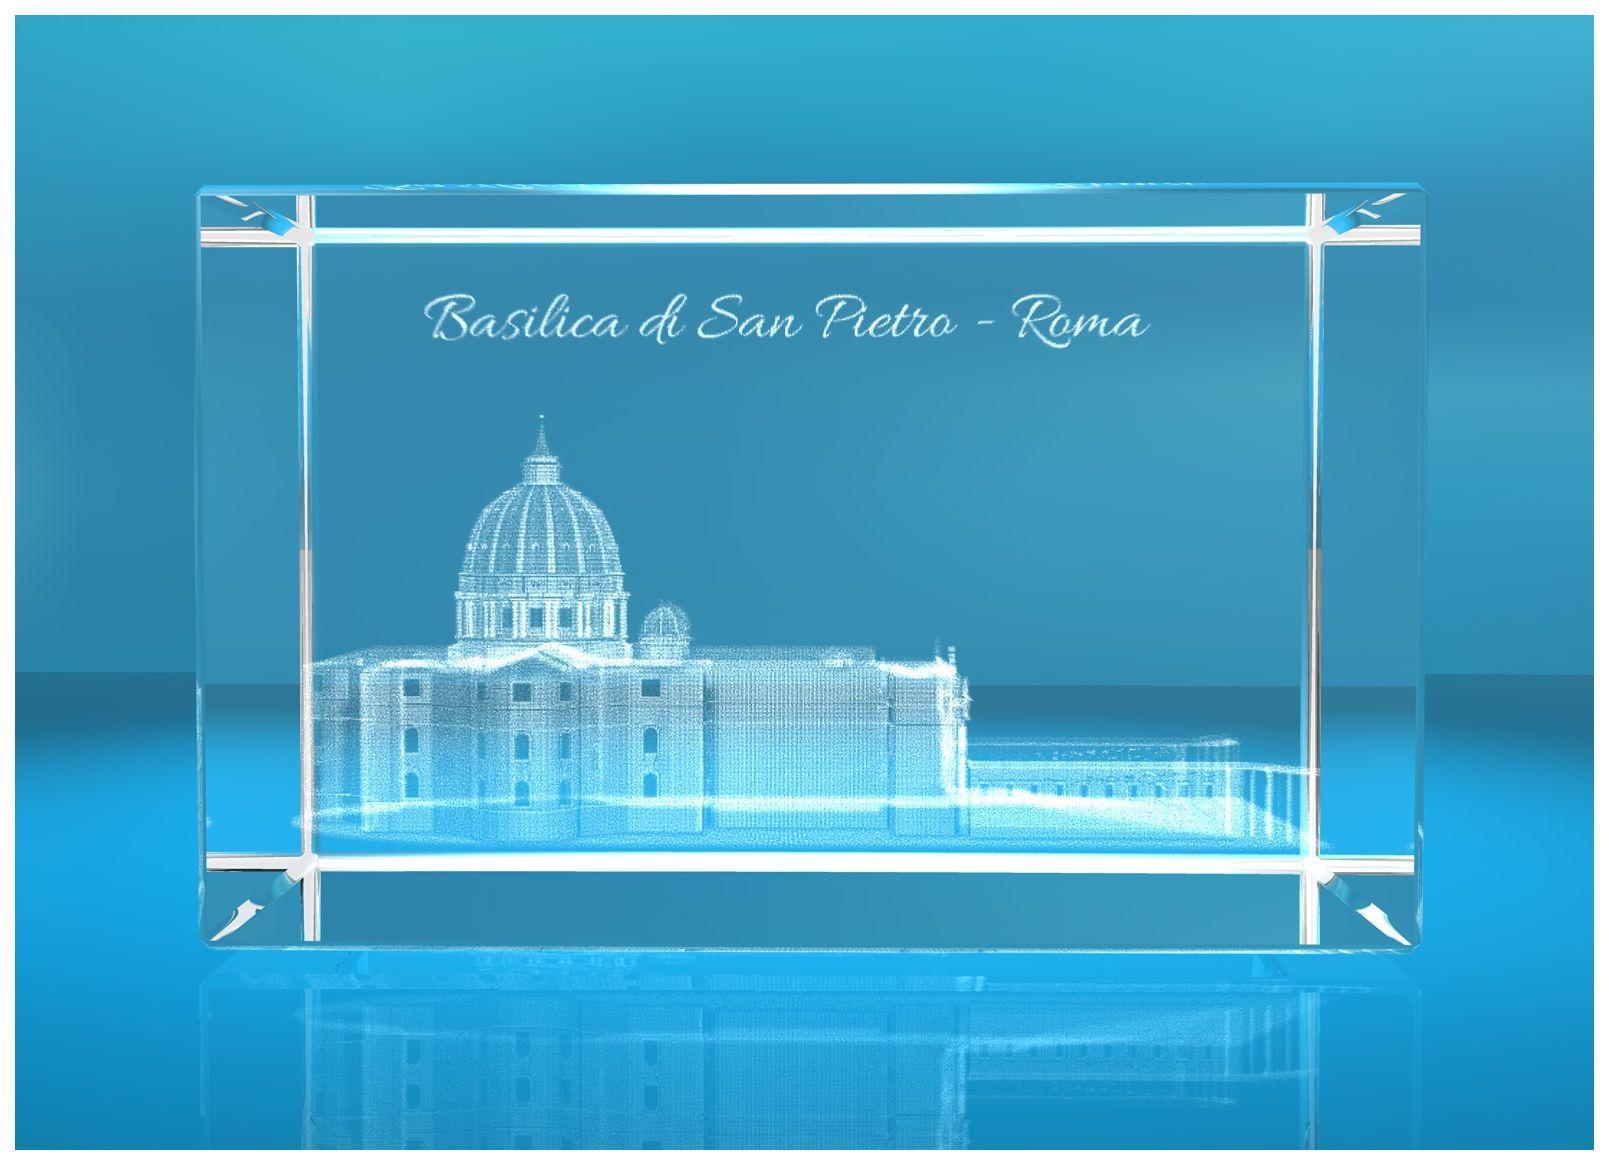 3D Glasquader   Motiv: Basilica di San Pietro Roma / Petersdom Rom